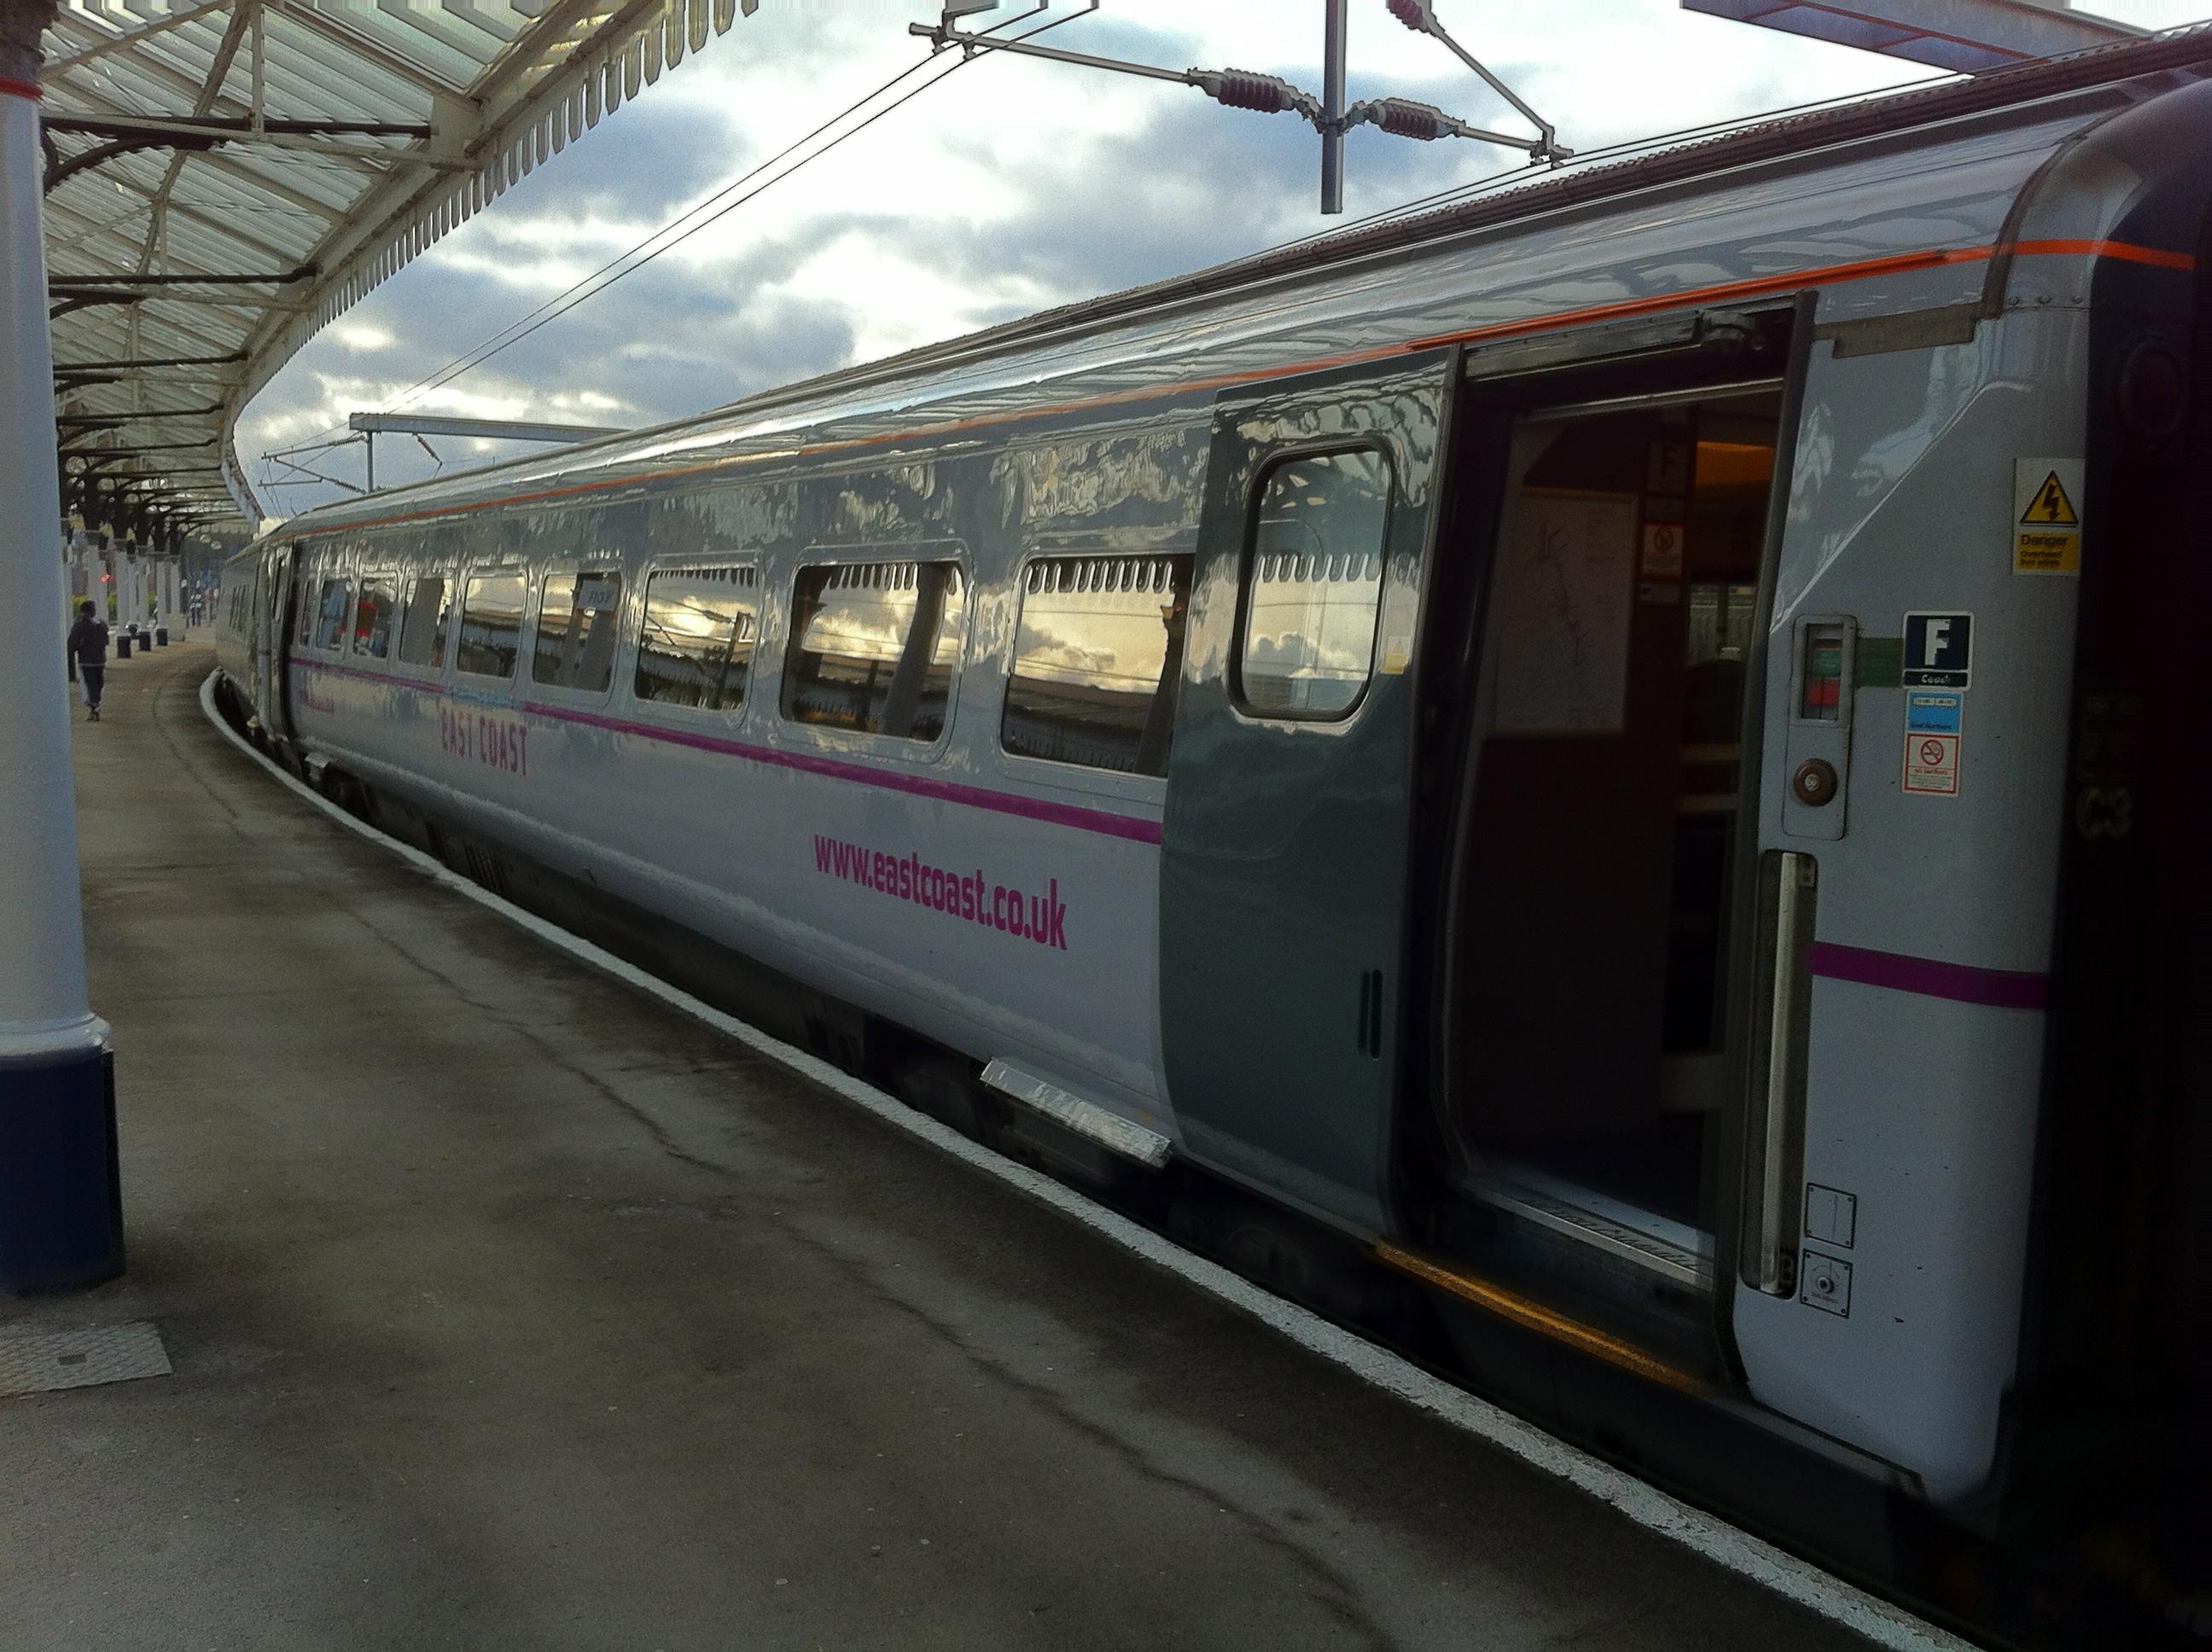 file british rail mark 4 coach in east coast 2011 livery jpgfile british rail mark 4 coach in east coast 2011 livery jpg